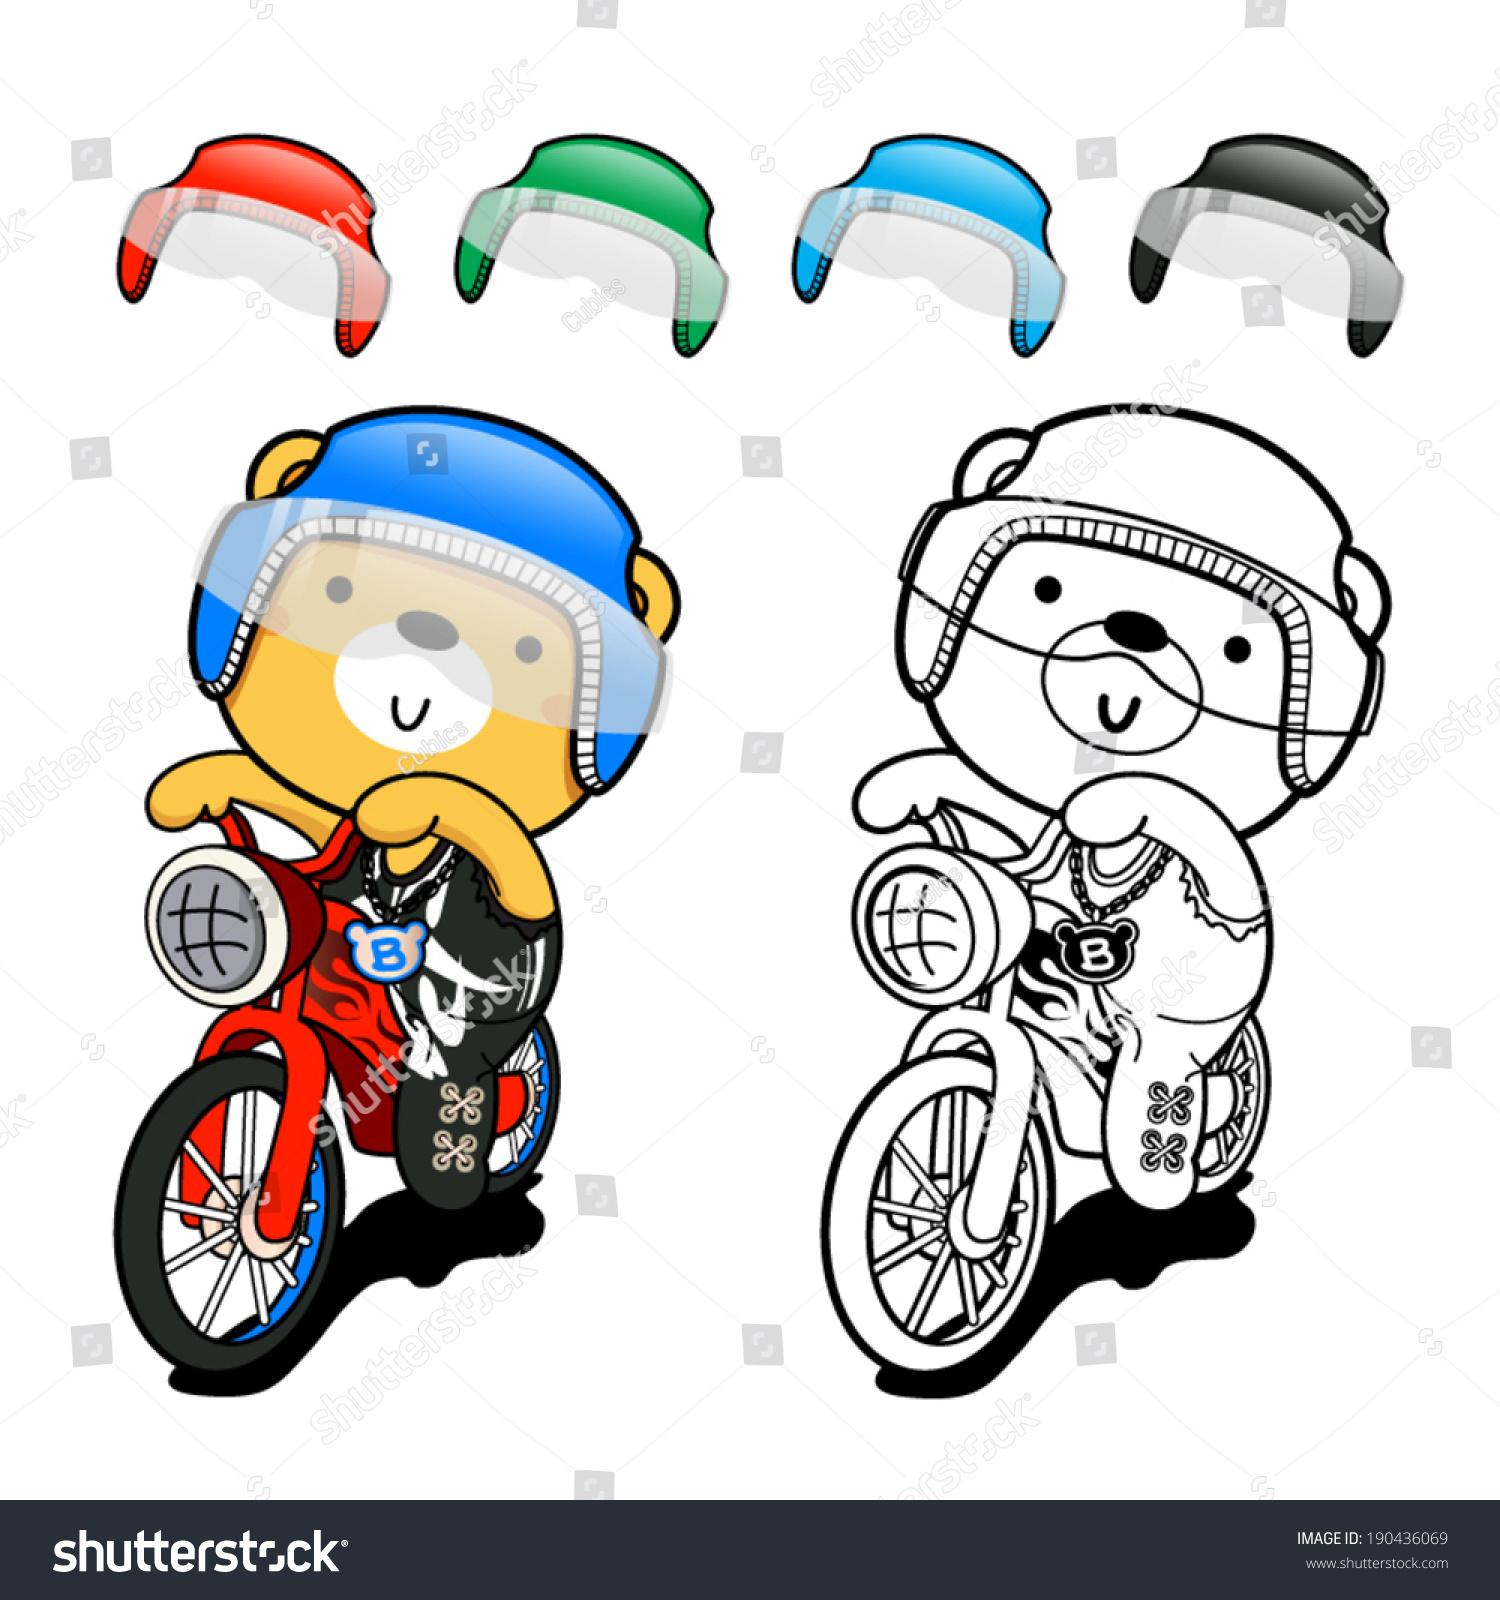 Bear Cute Posing On Bike Stock Vector 190436069 Shutterstock